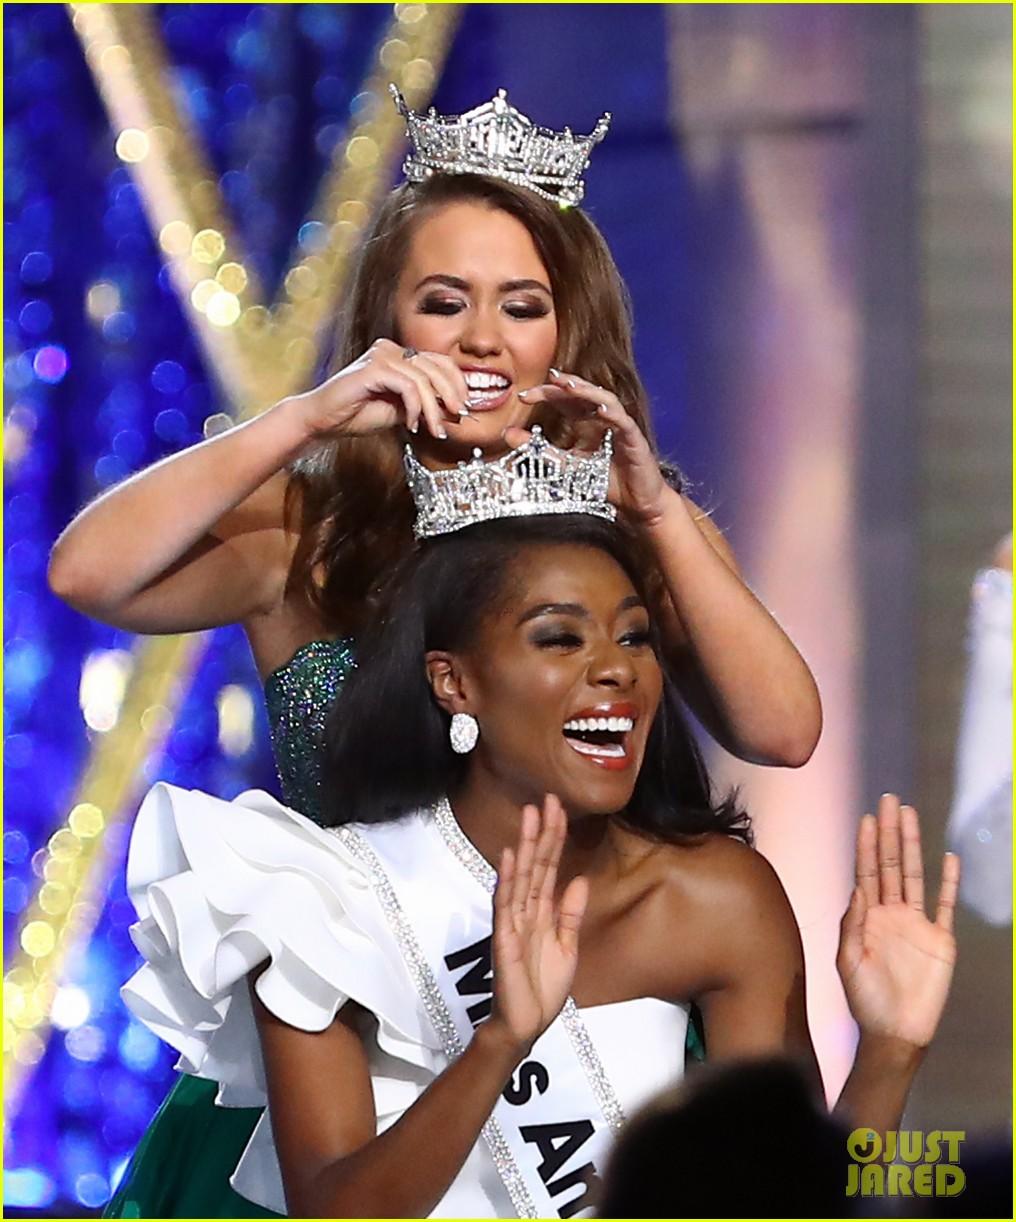 nia imani franklin, miss america 2019. Miss-america-2019-new-york-nia-imani-franklin-12